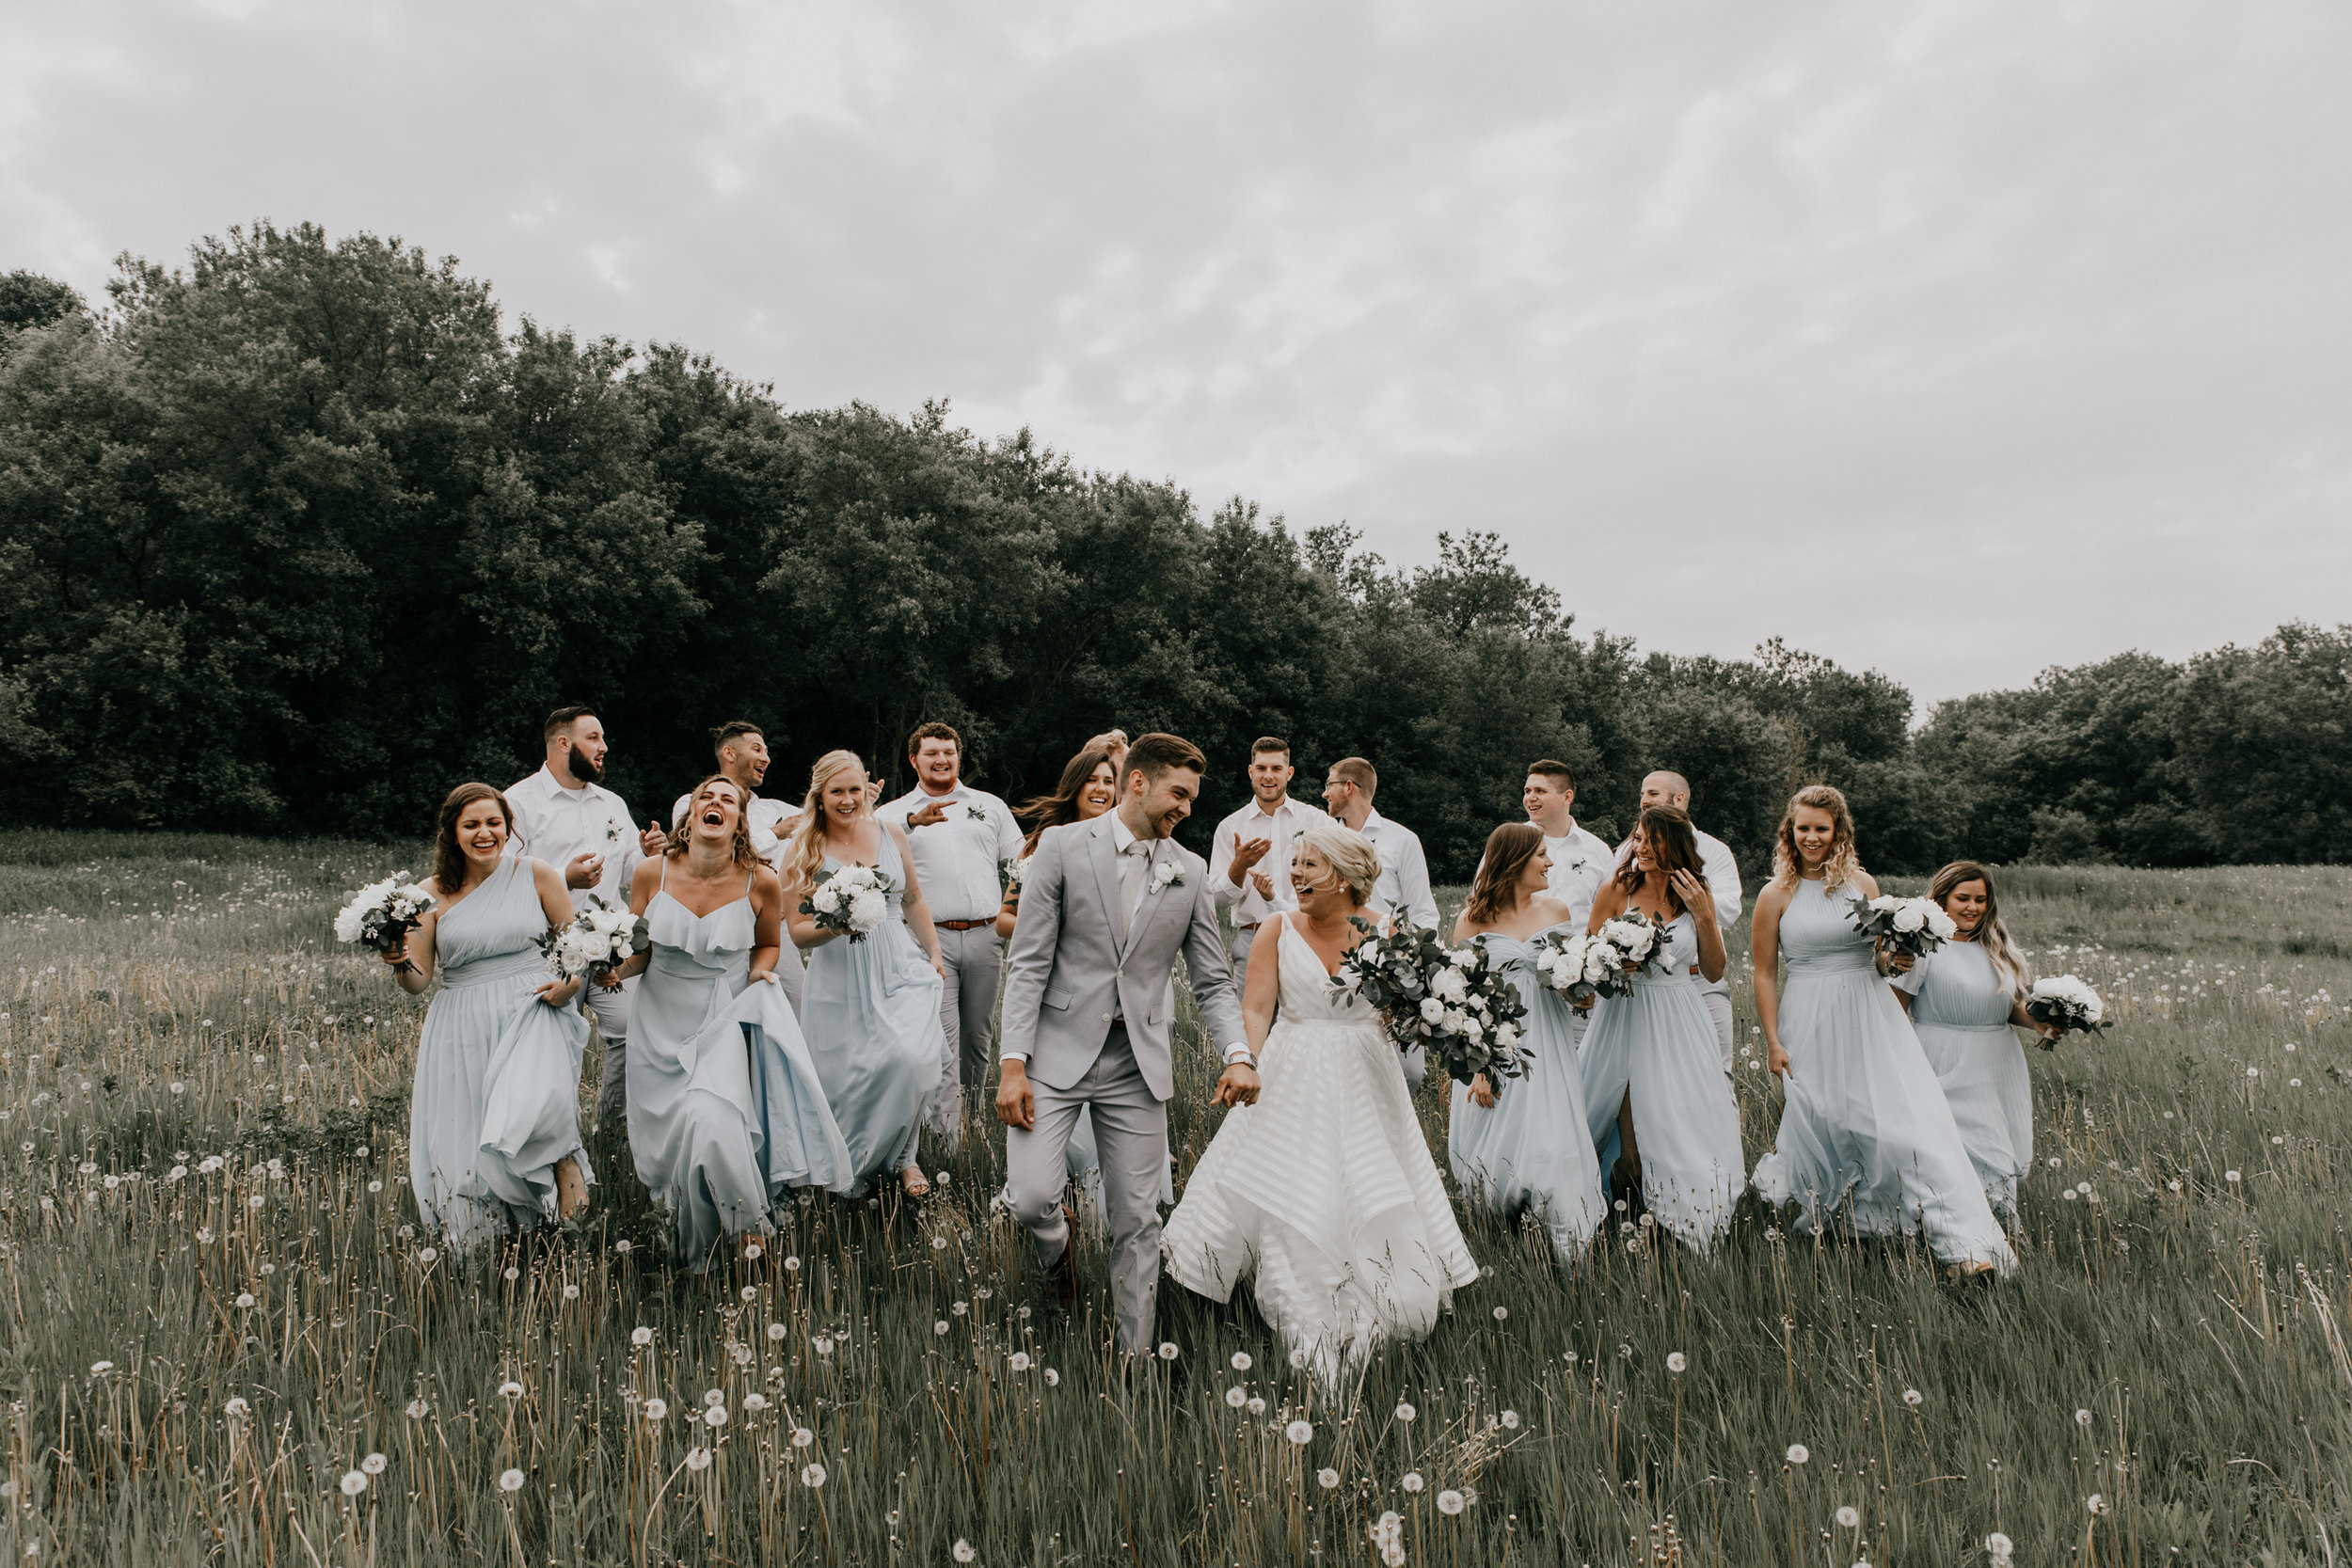 WeddingvideographerinSanDiego.jpg